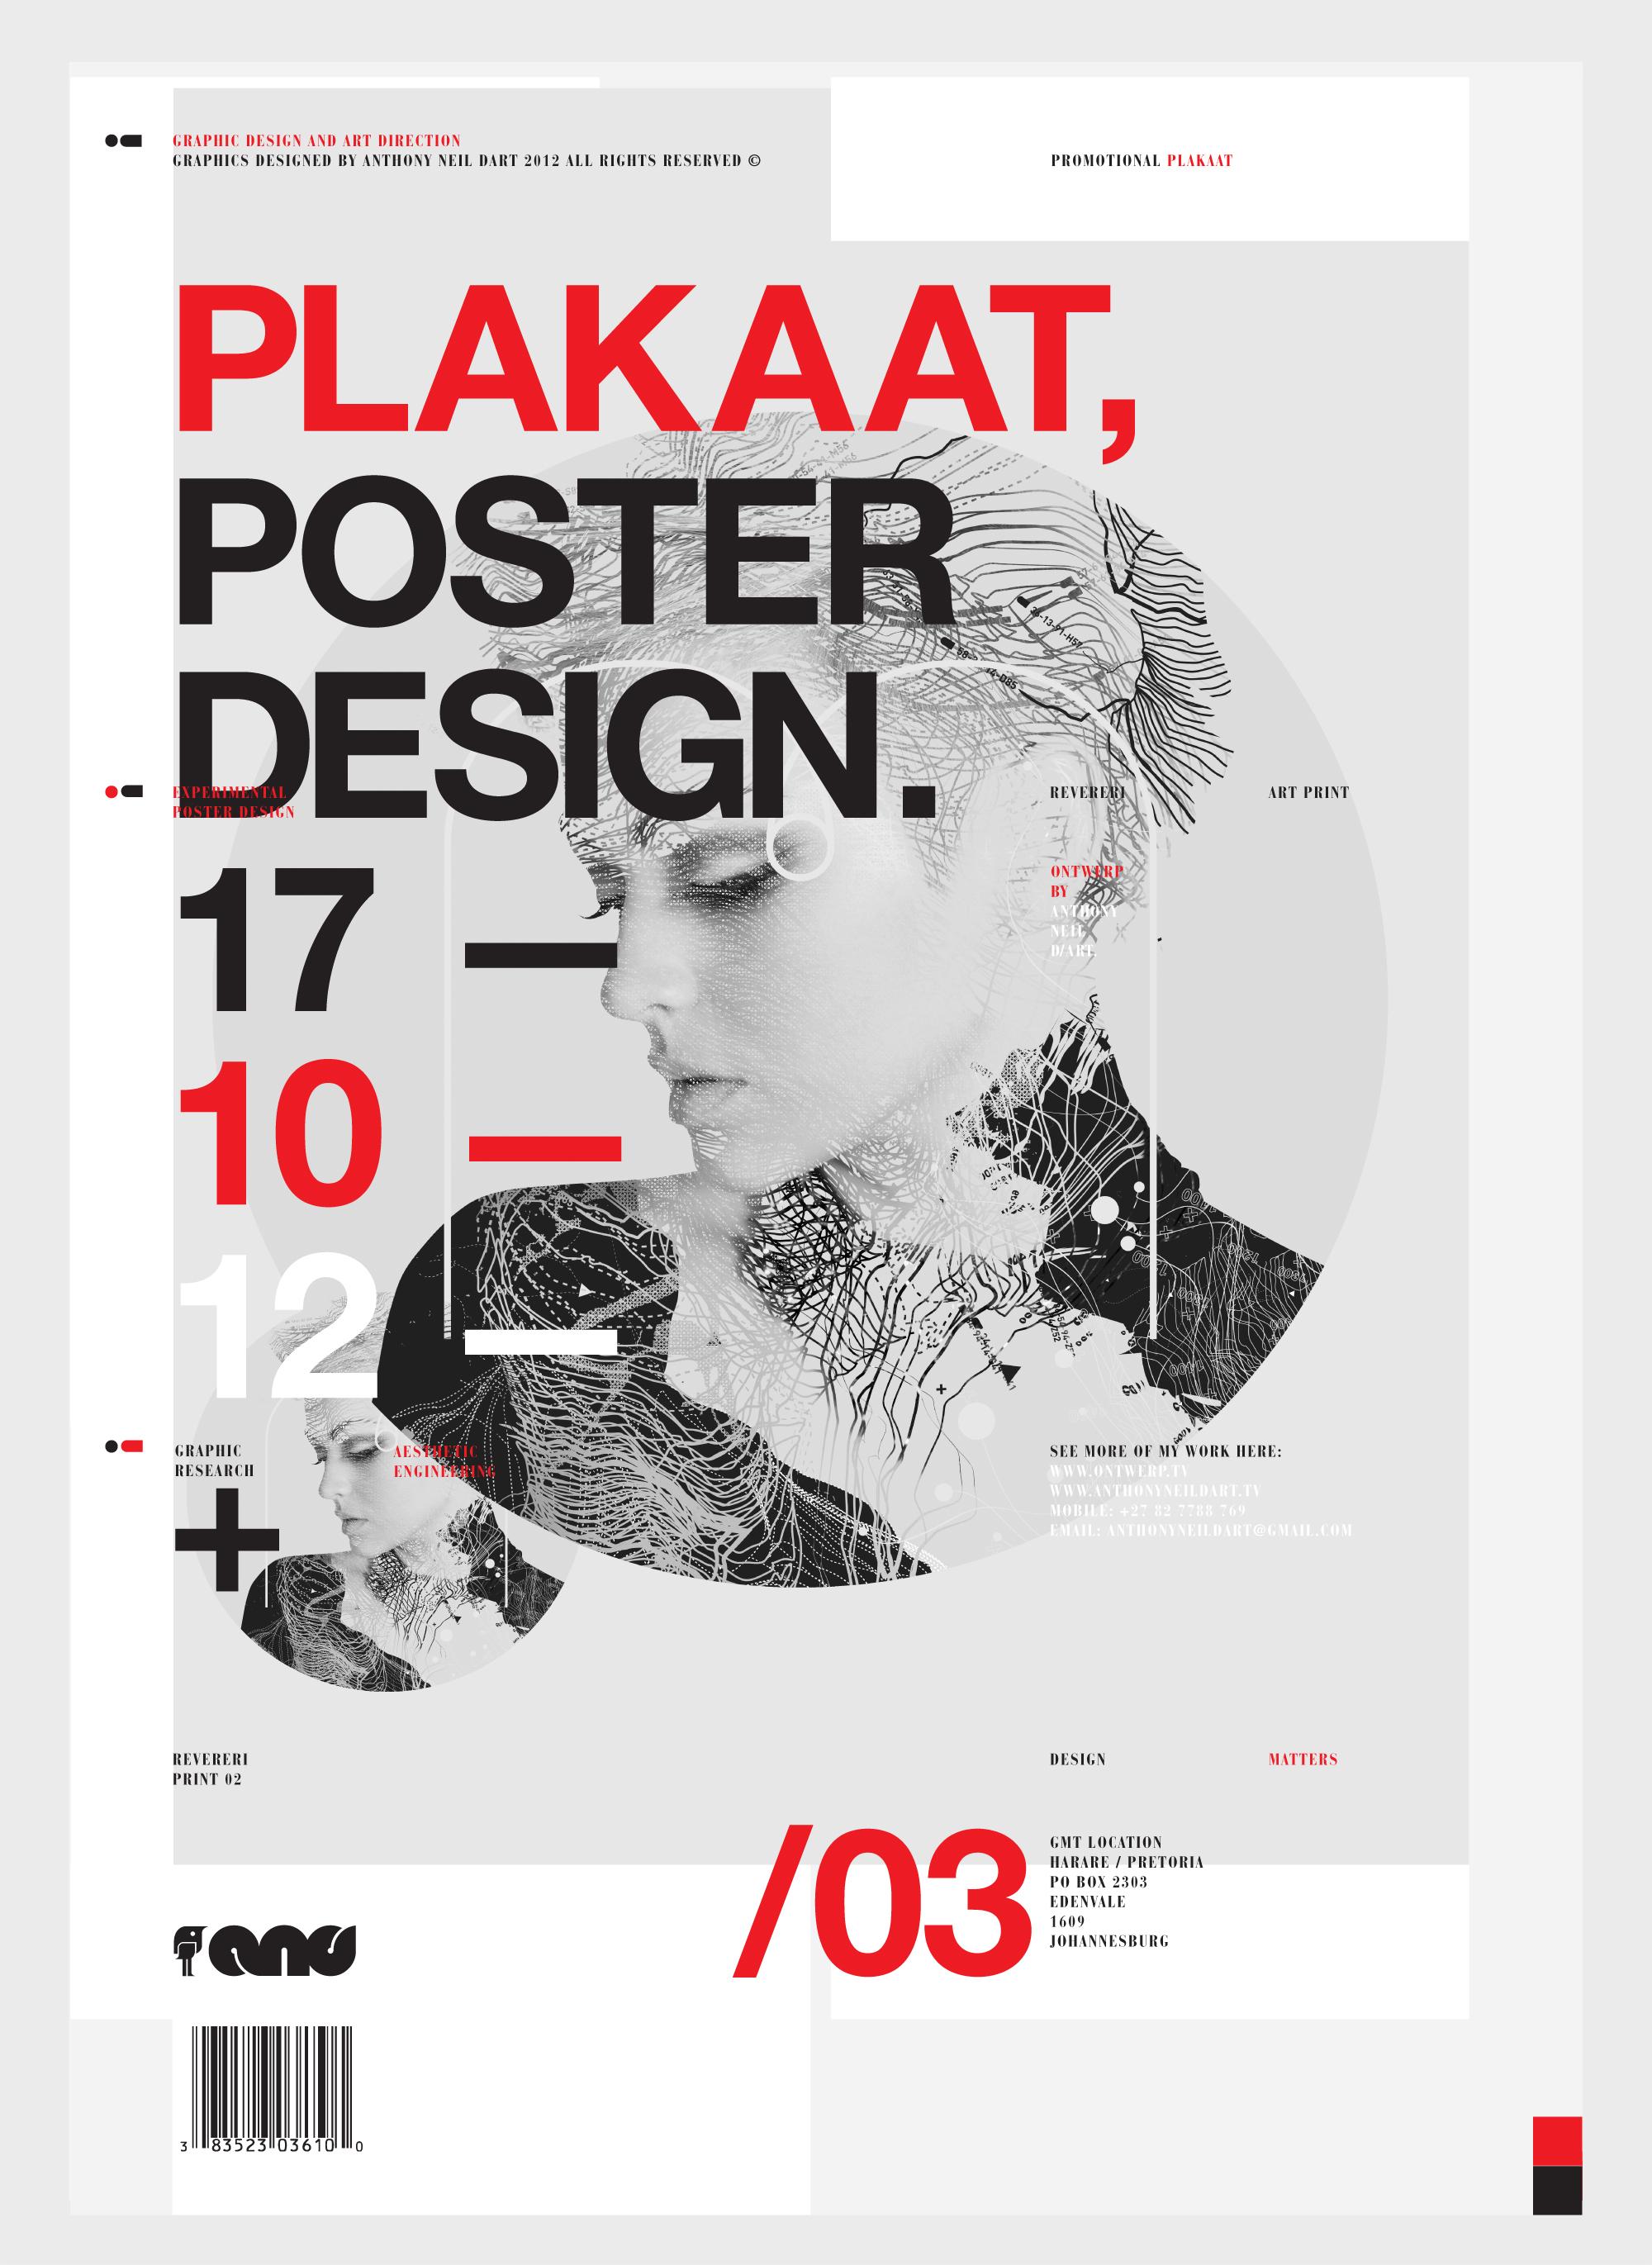 Poster design johannesburg - Poster Design Johannesburg Poster Design Johannesburg 36